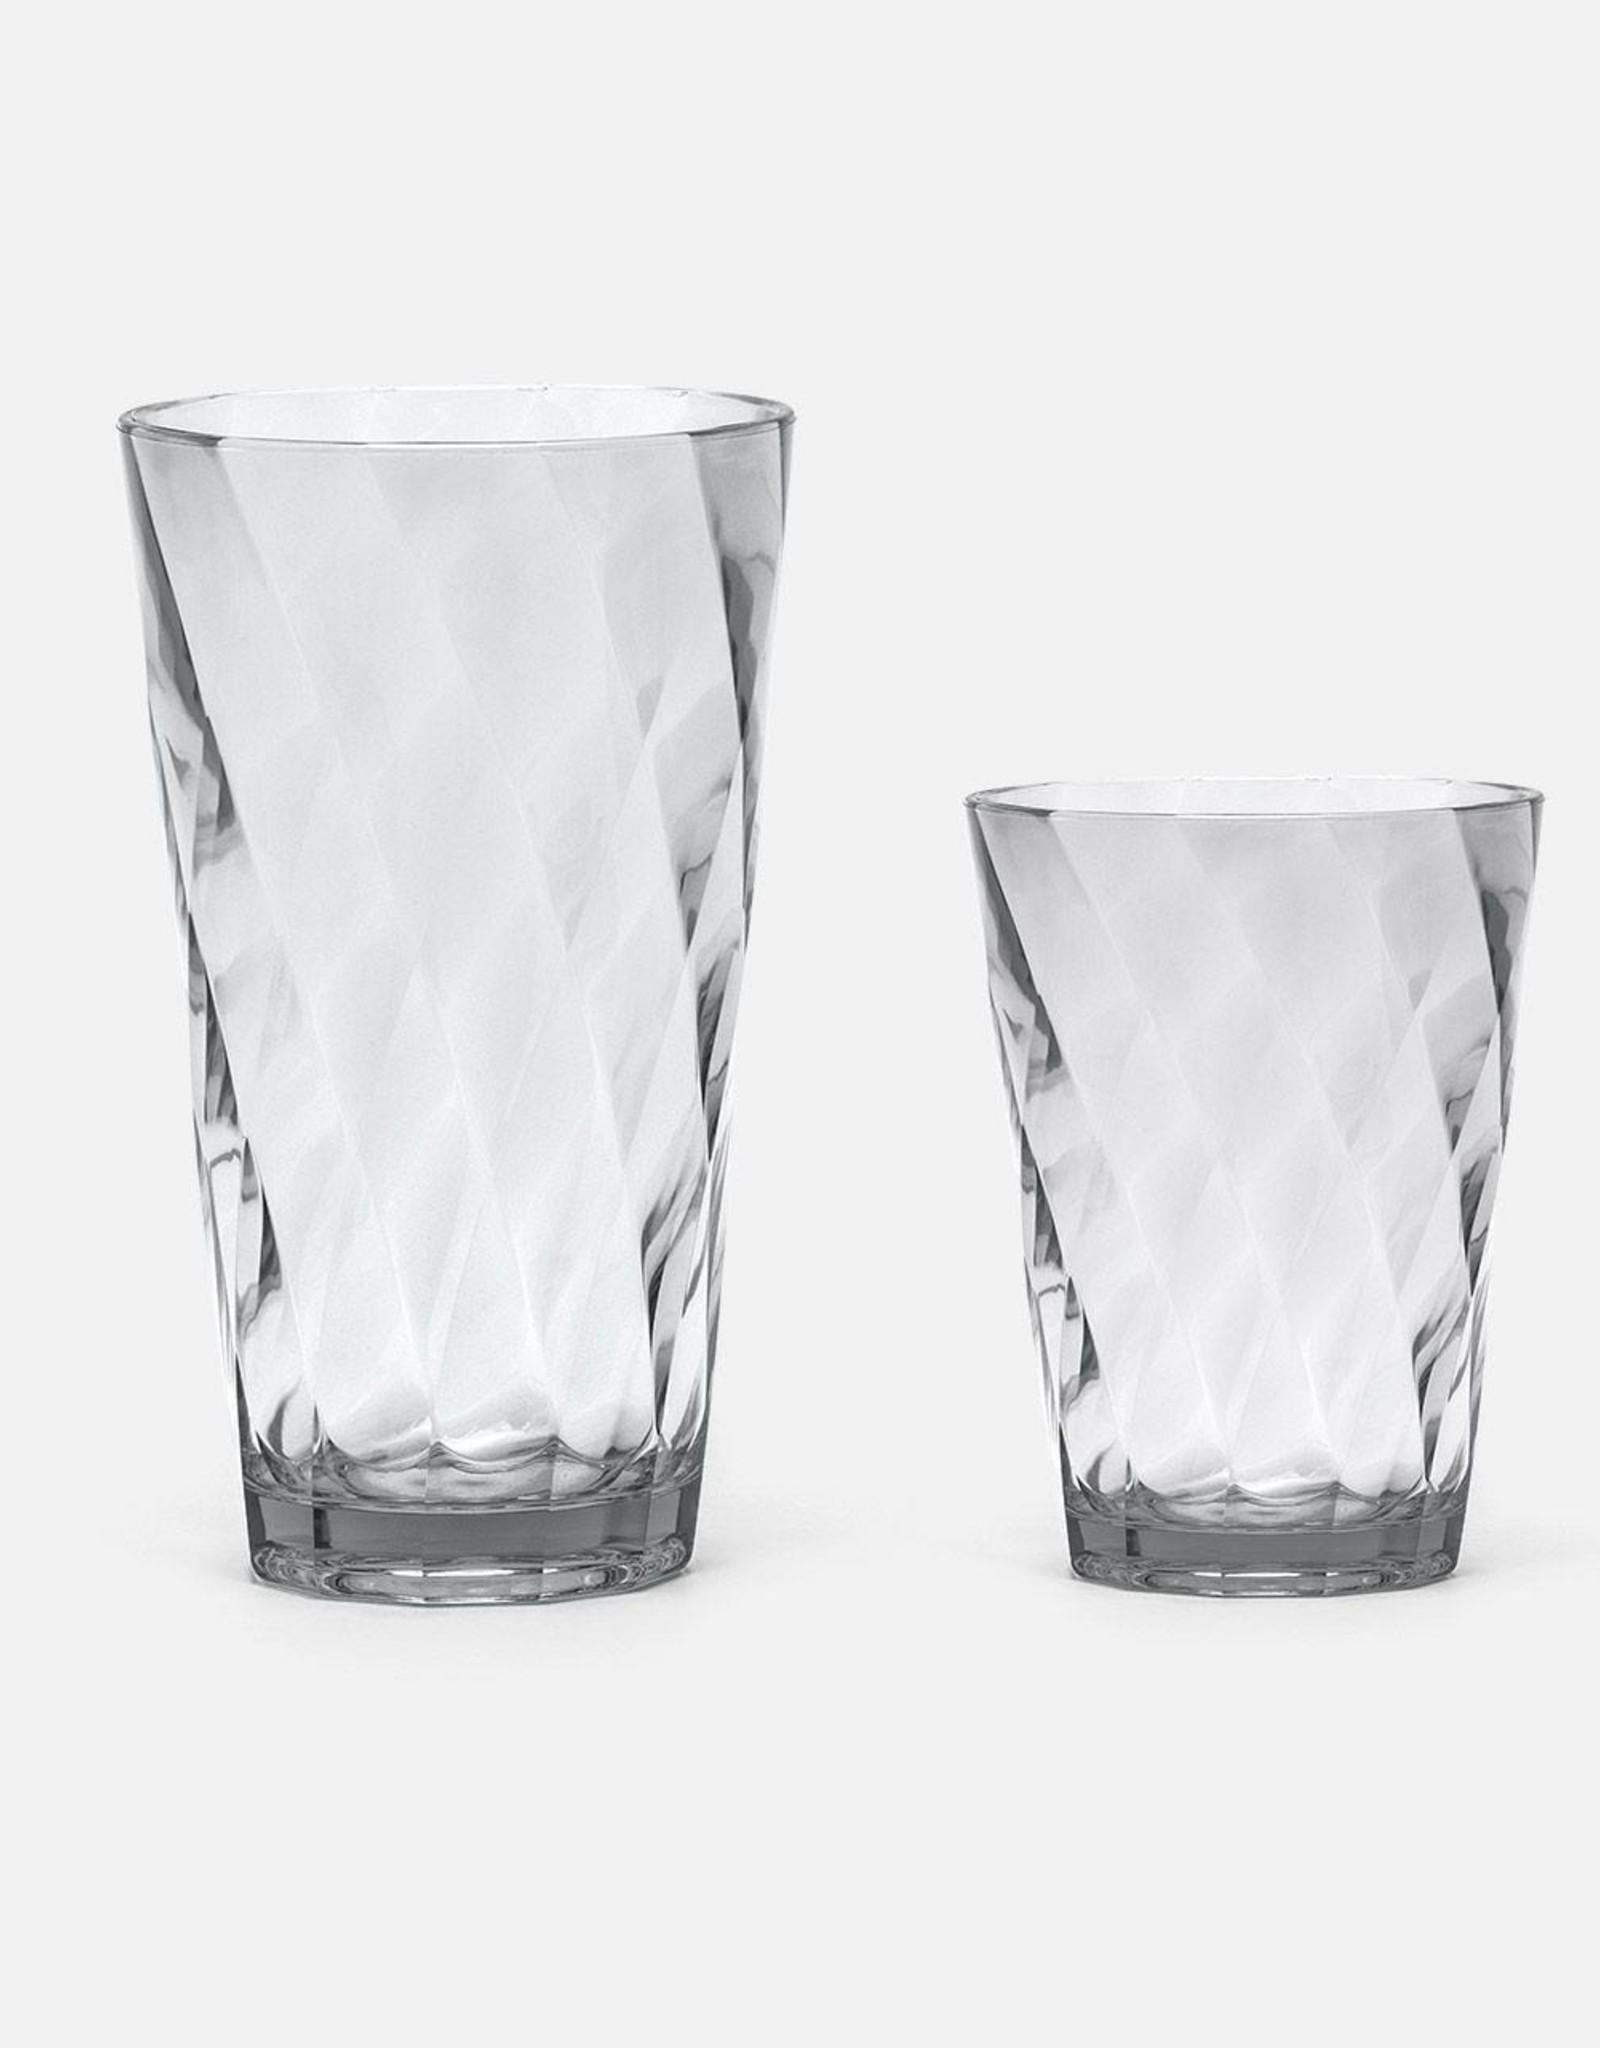 Blue Pheasant Beverly Acrylic Light Gray Glassware